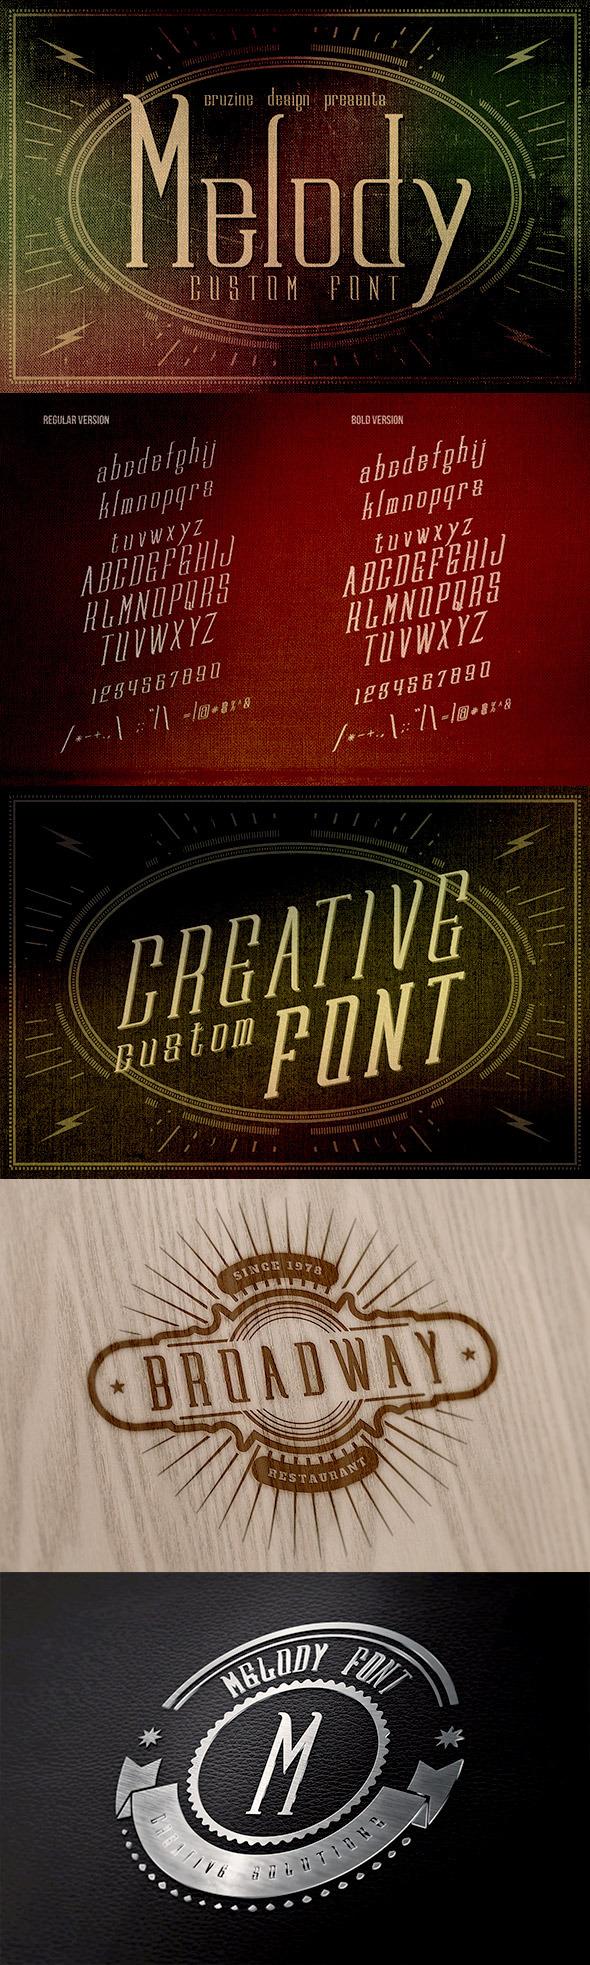 Melody Custom Font